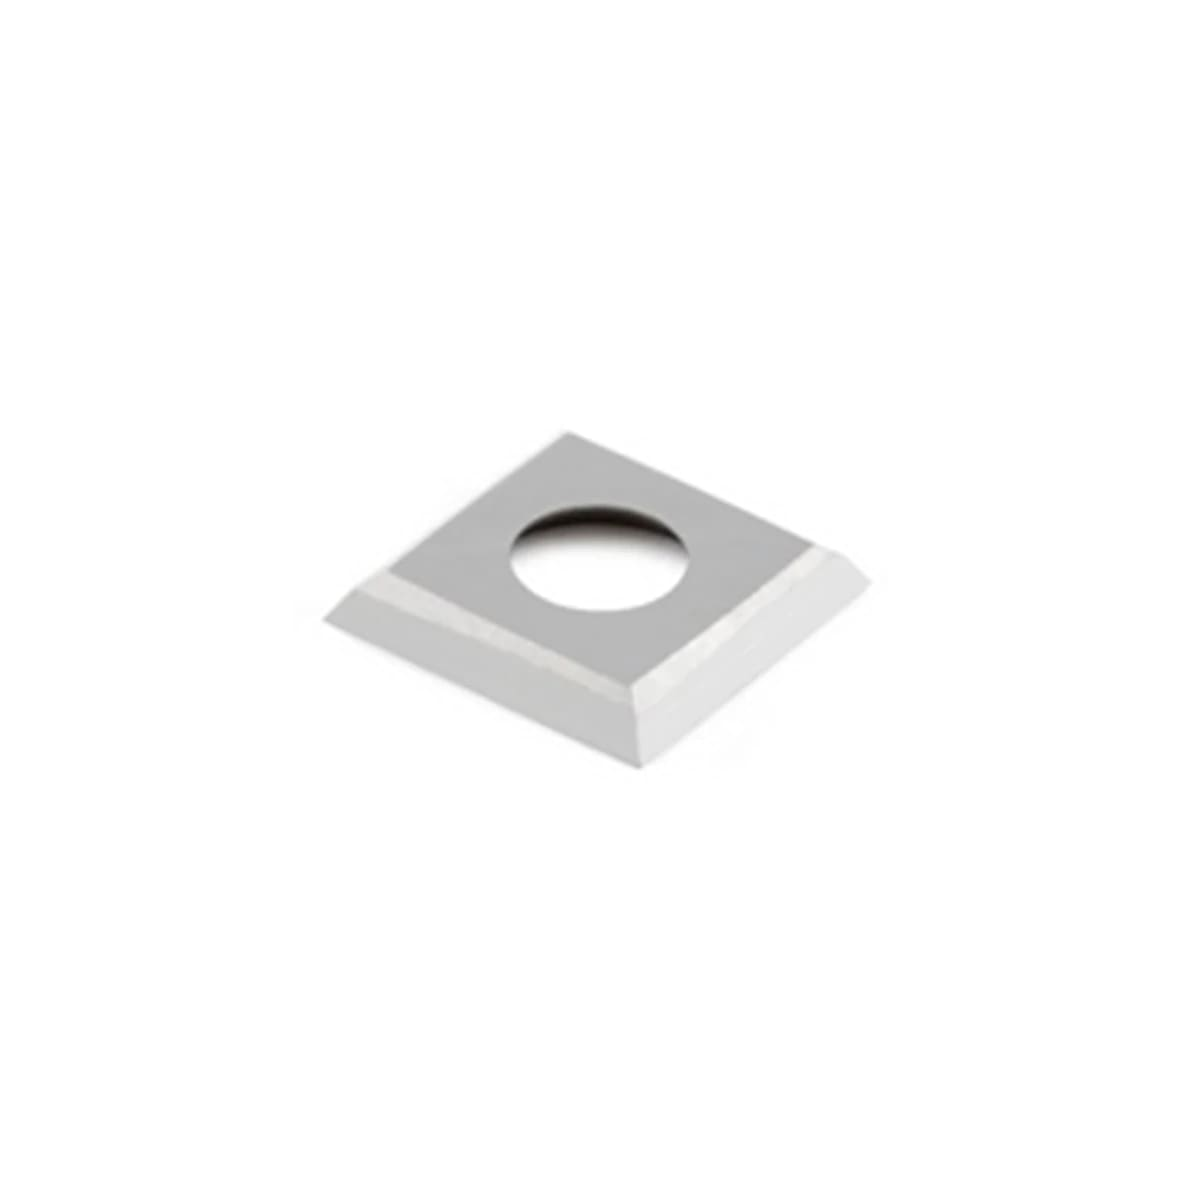 Inserto Pastilha De Videa Metal Duro 15 X 15 X 2,5 RR01MCA310